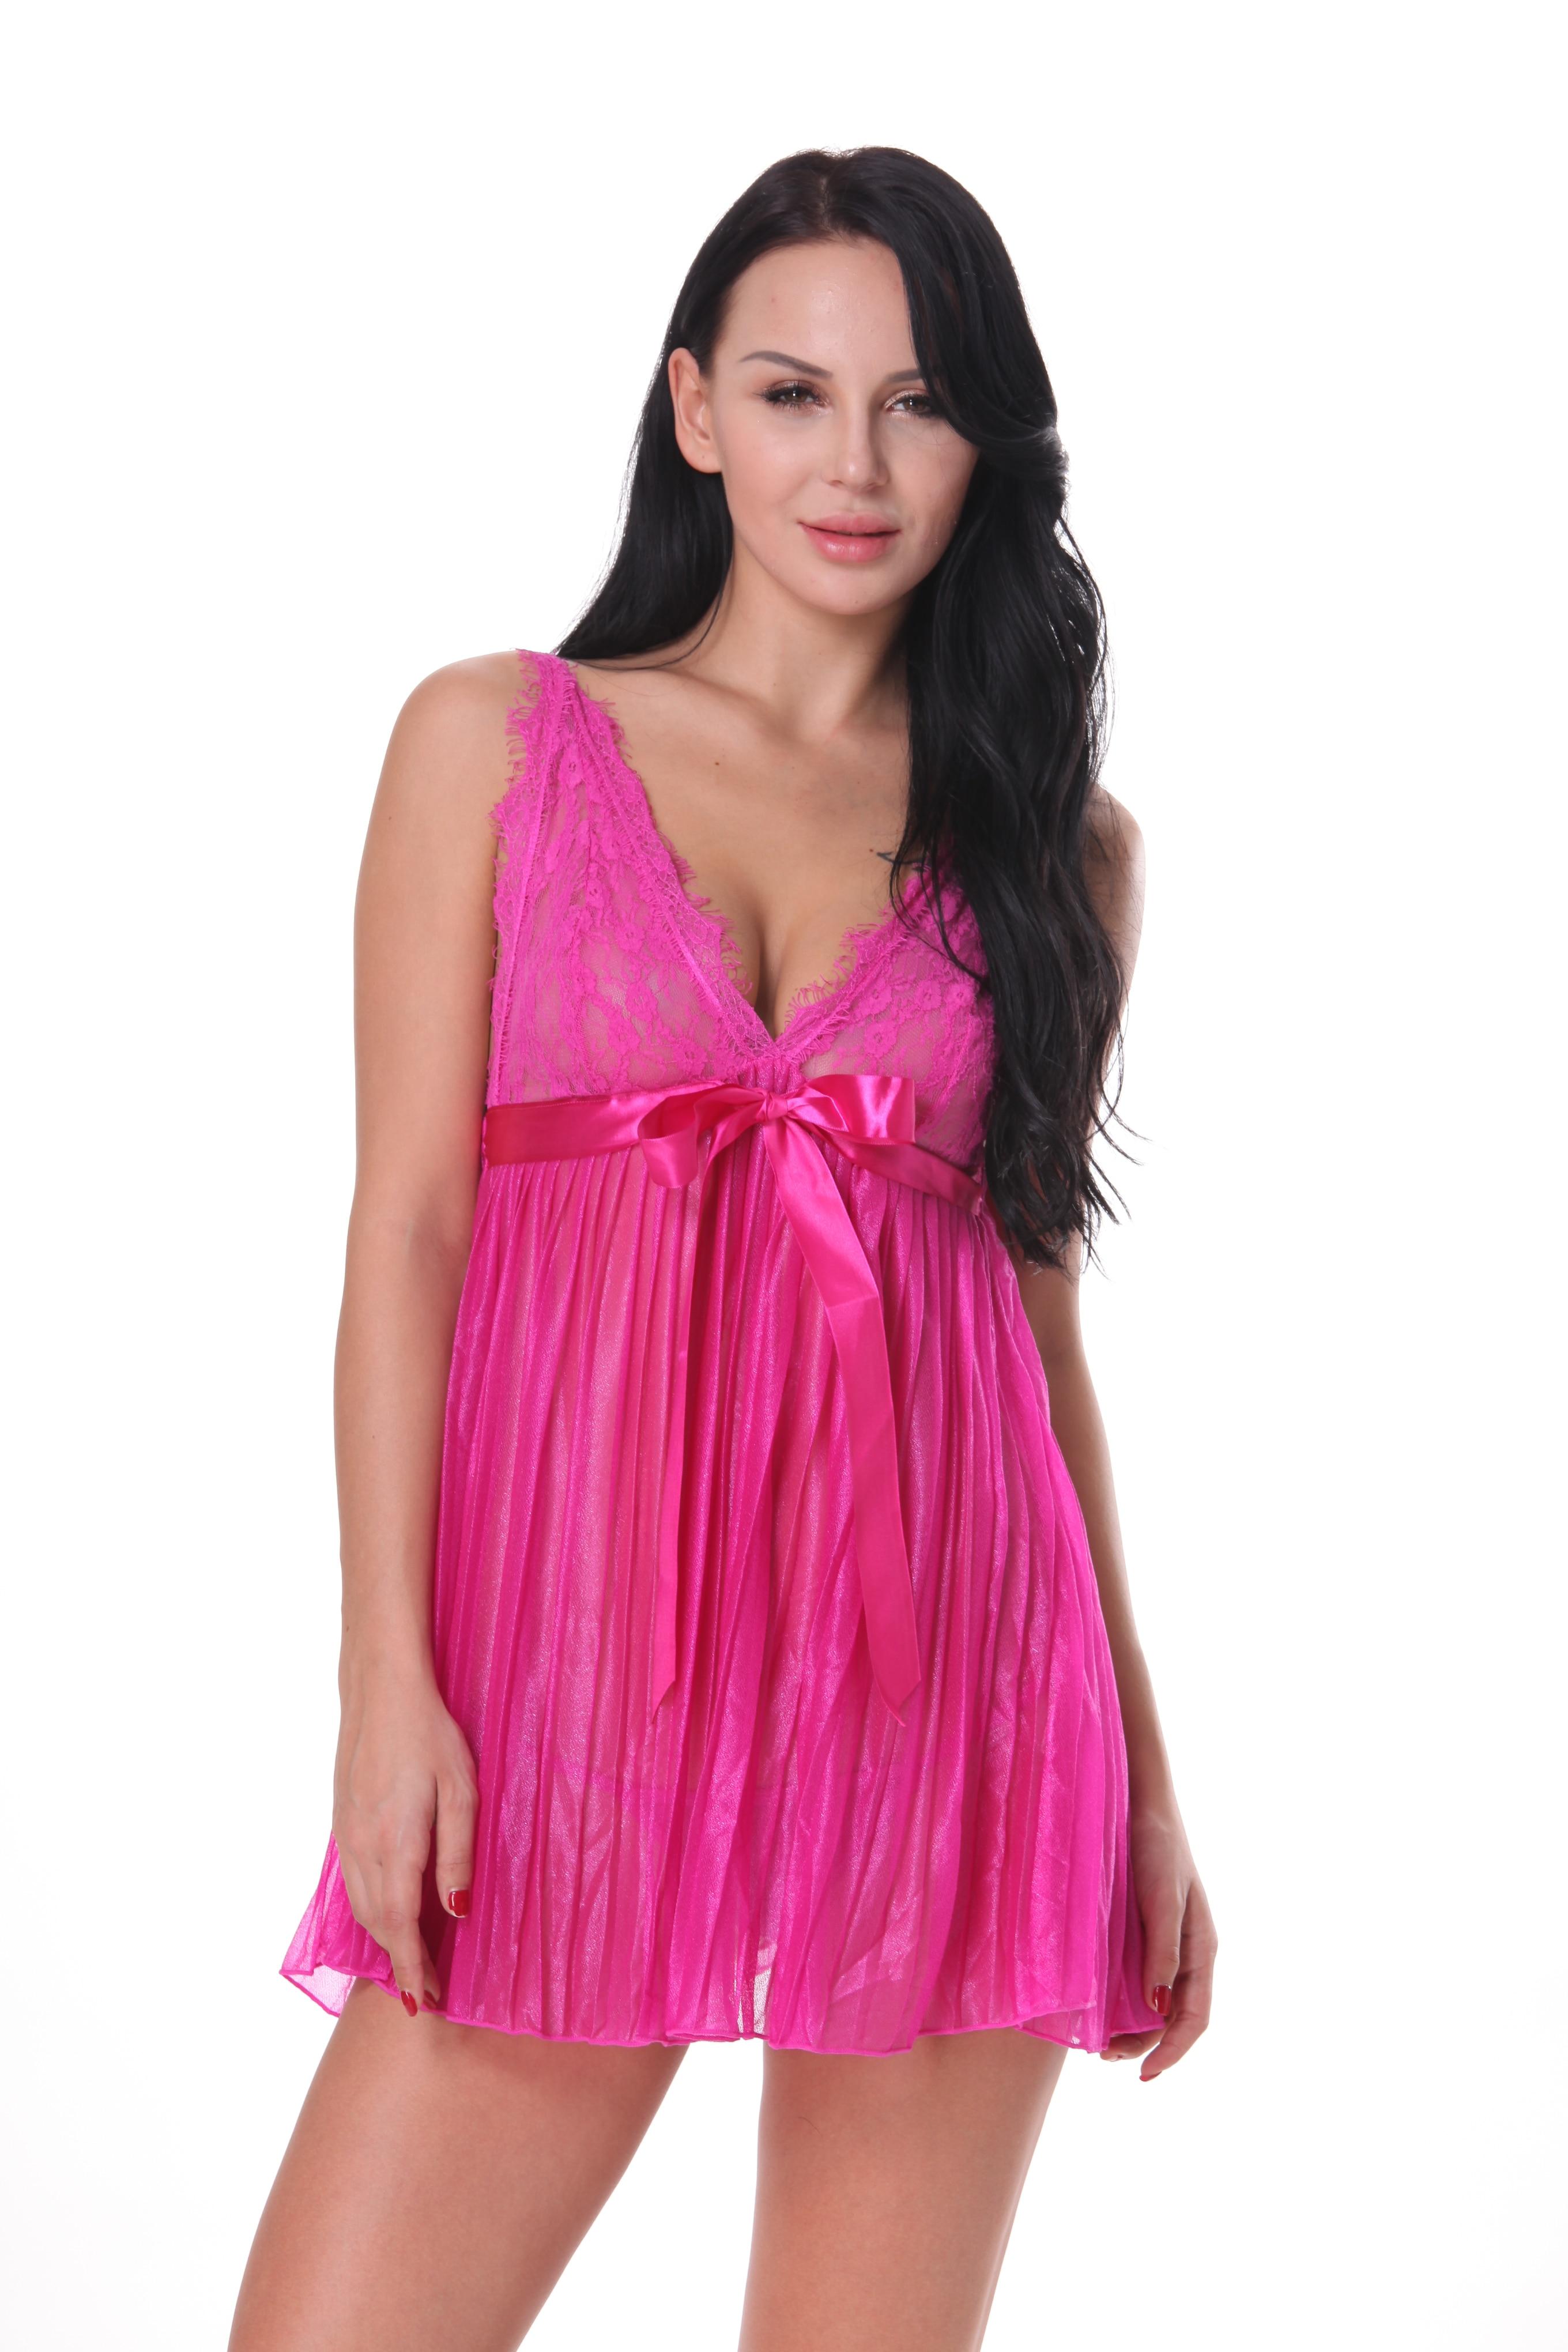 Small Crop Of Purple Lace Dress